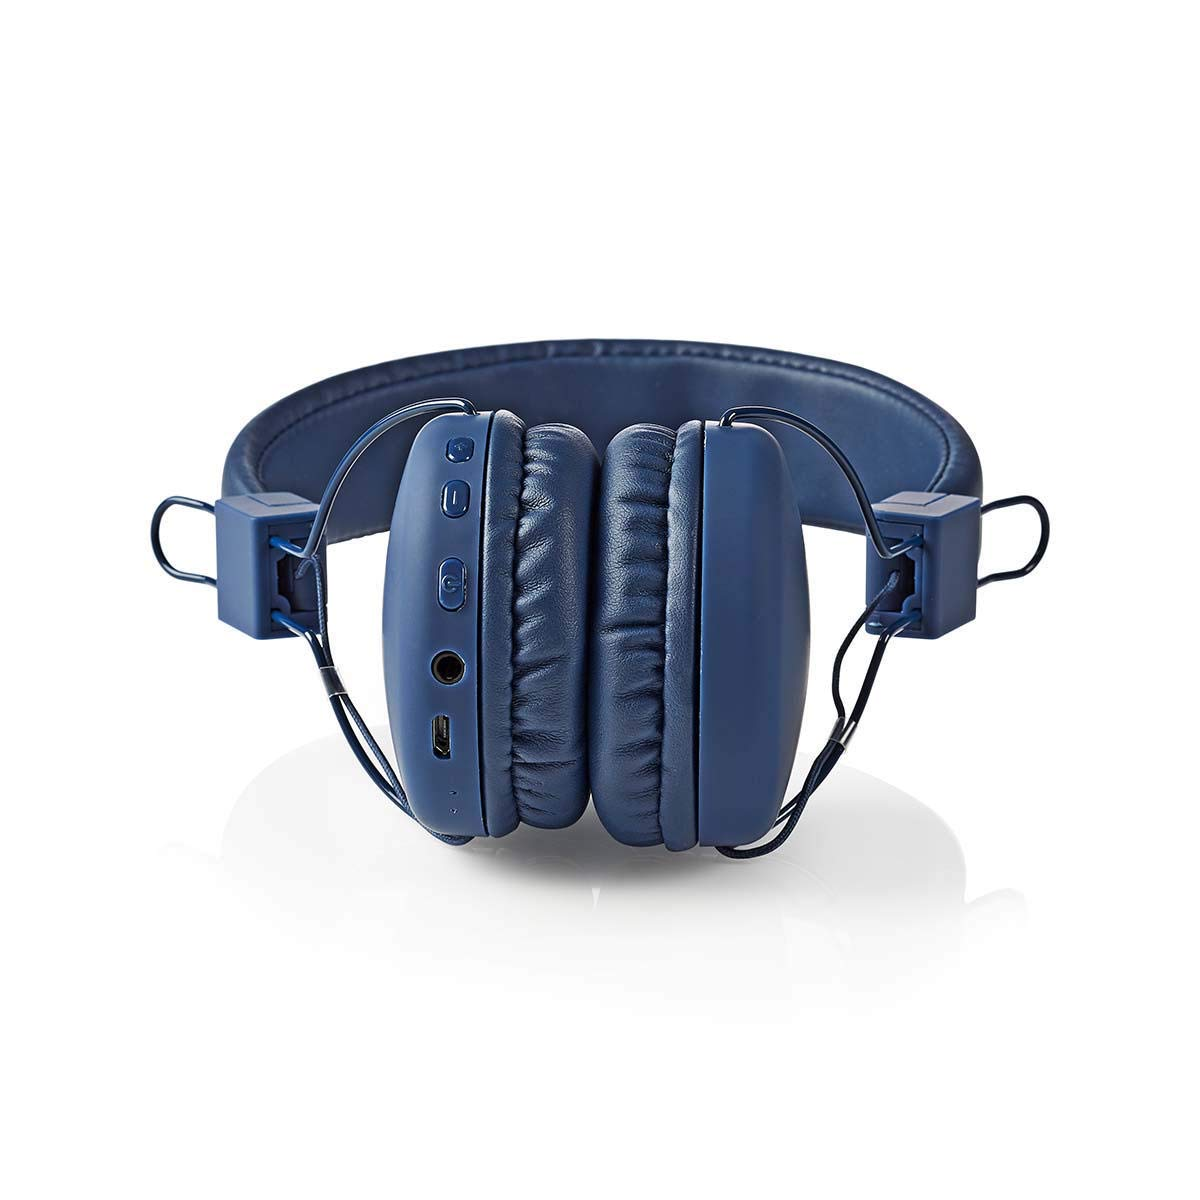 tronicxl Bluetooth V 4.2 Auricular Auriculares con micrófono para iPhone Android Smartphone ZB Samsung Huawei LG etc. Azul: Amazon.es: Electrónica